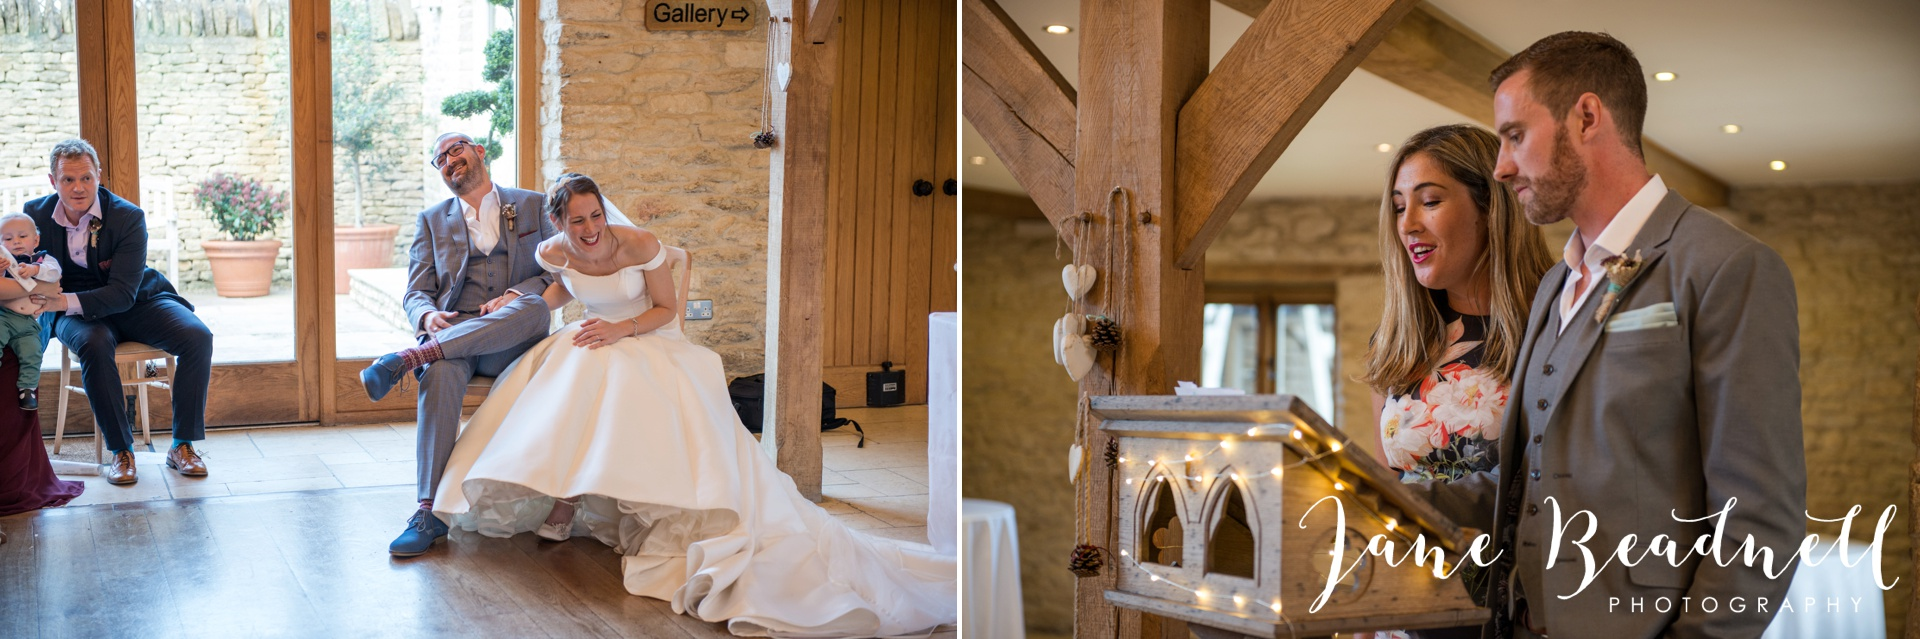 The Kingcote Barn Bristol Yorkshire and destination wedding photographer Jane Beadnell Photography_0049